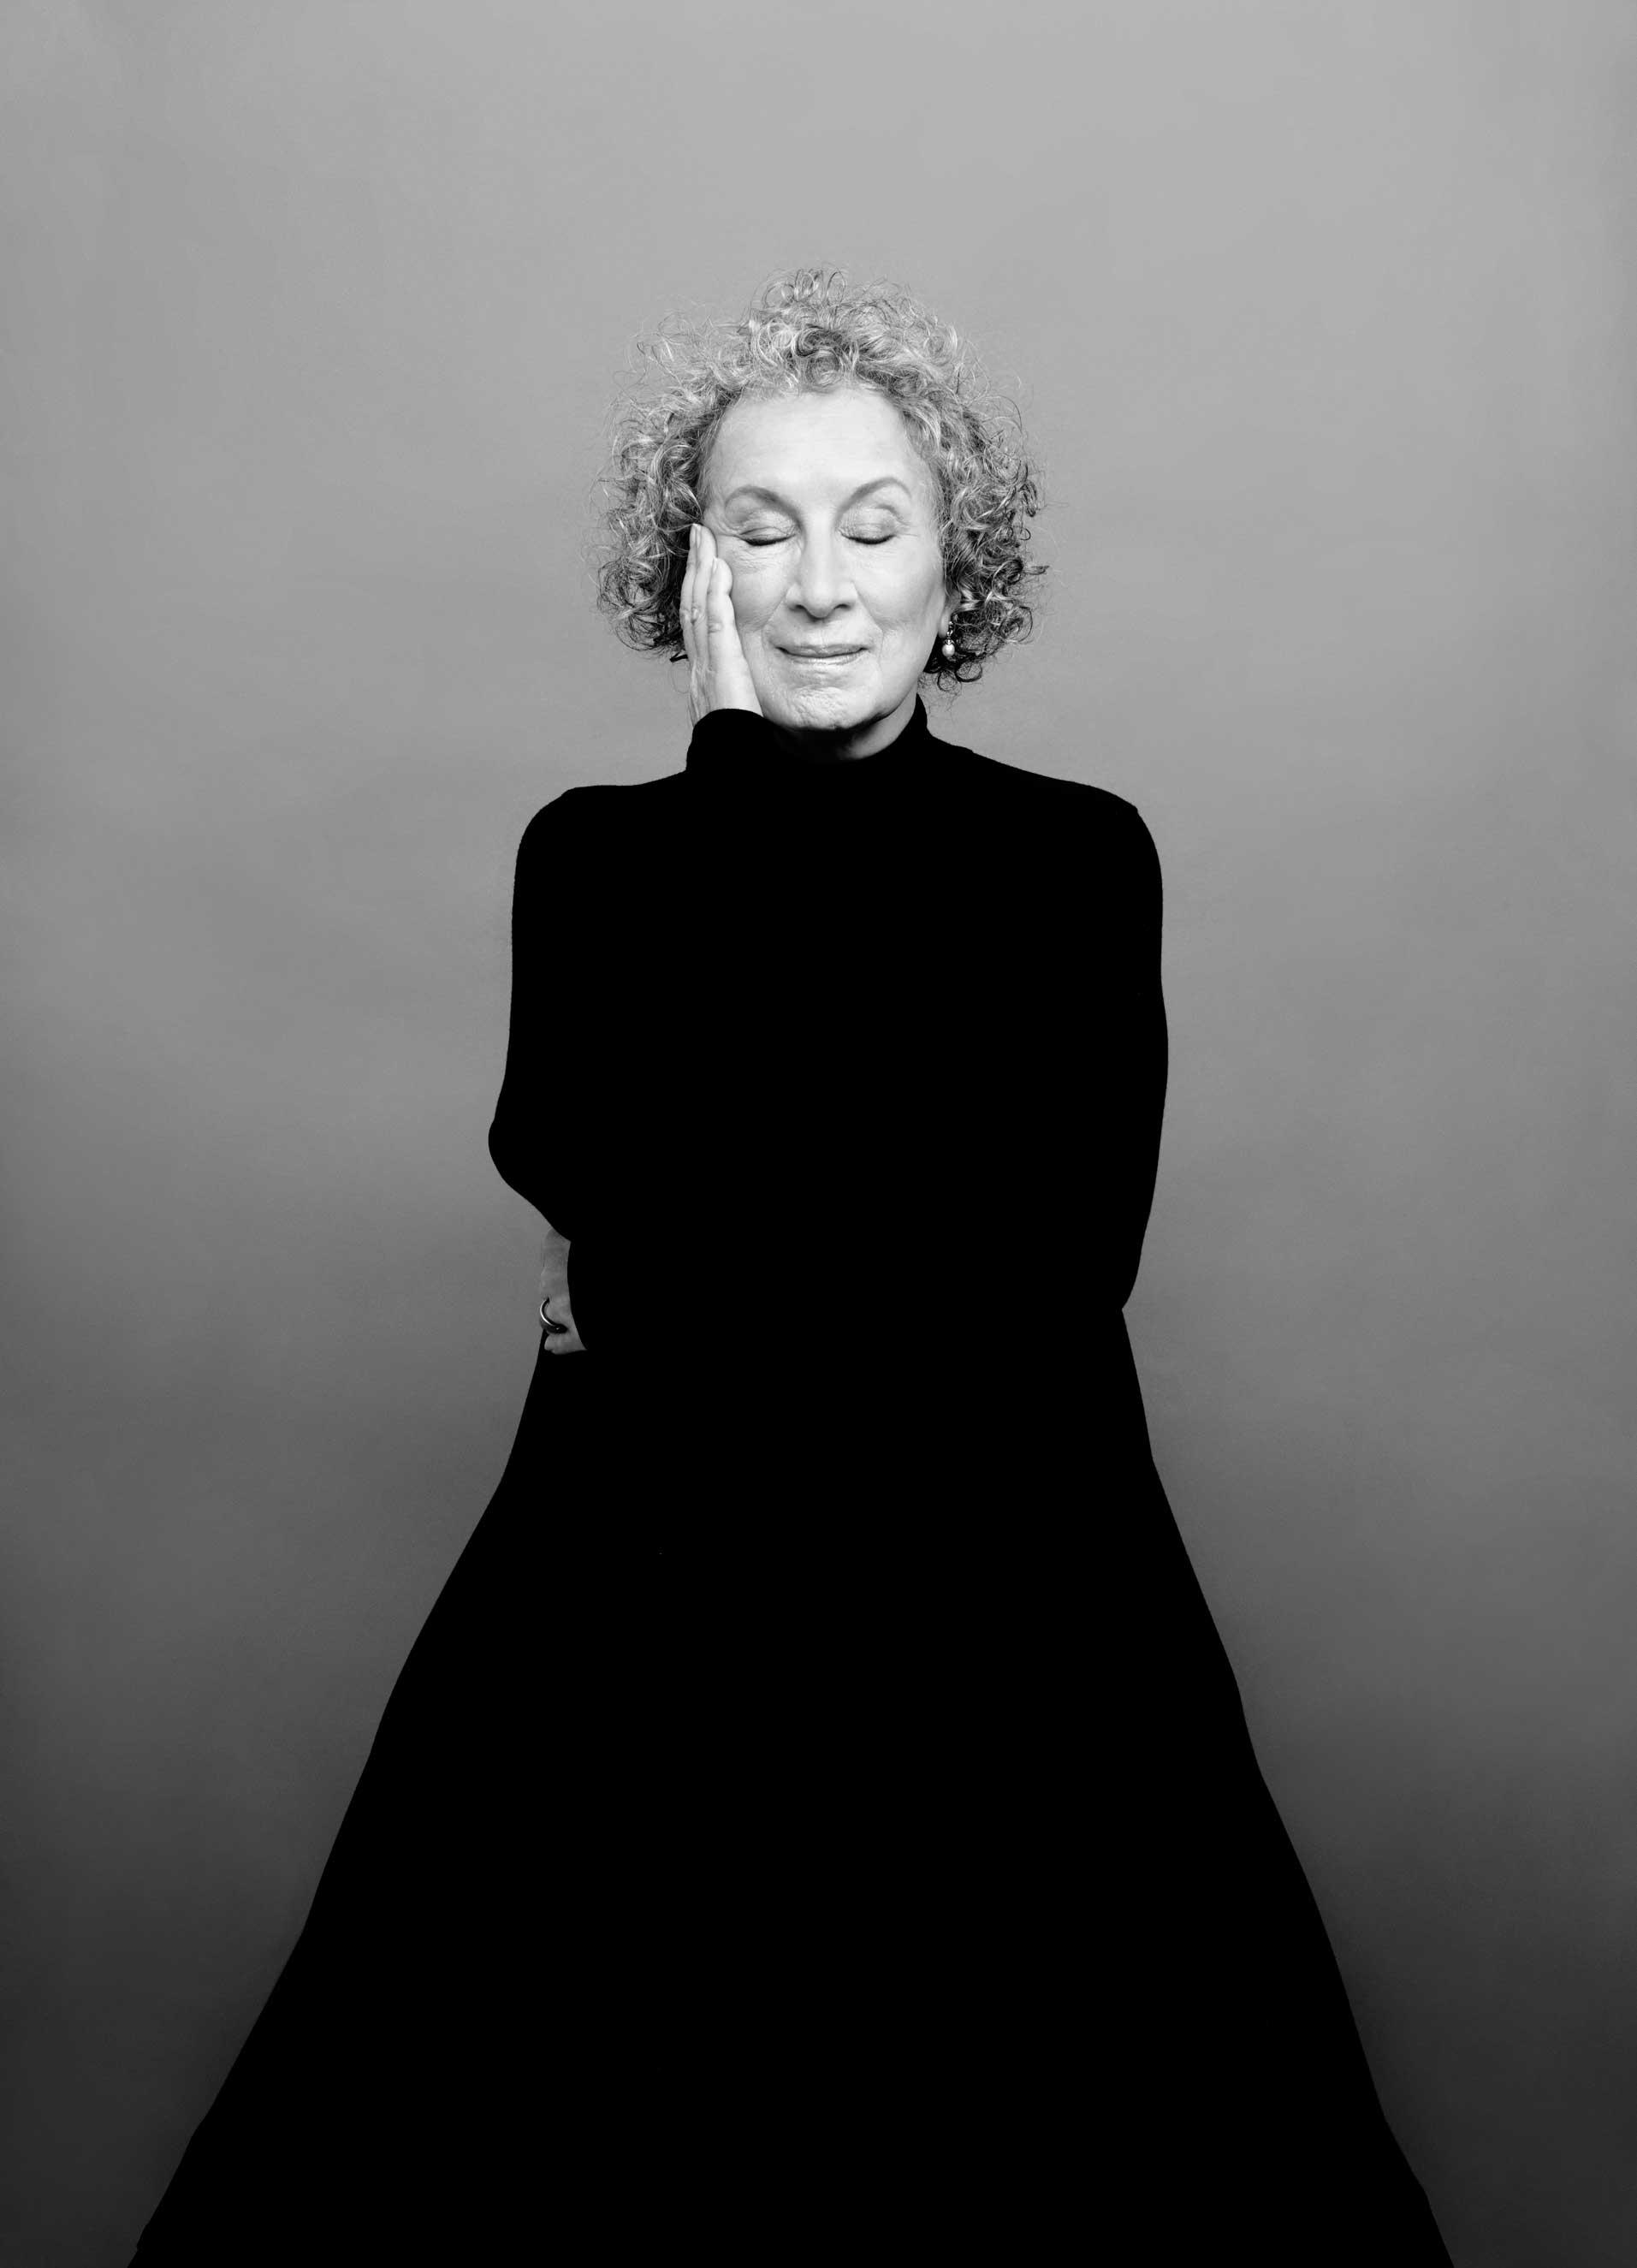 Atwood, Margaret 1.jpg